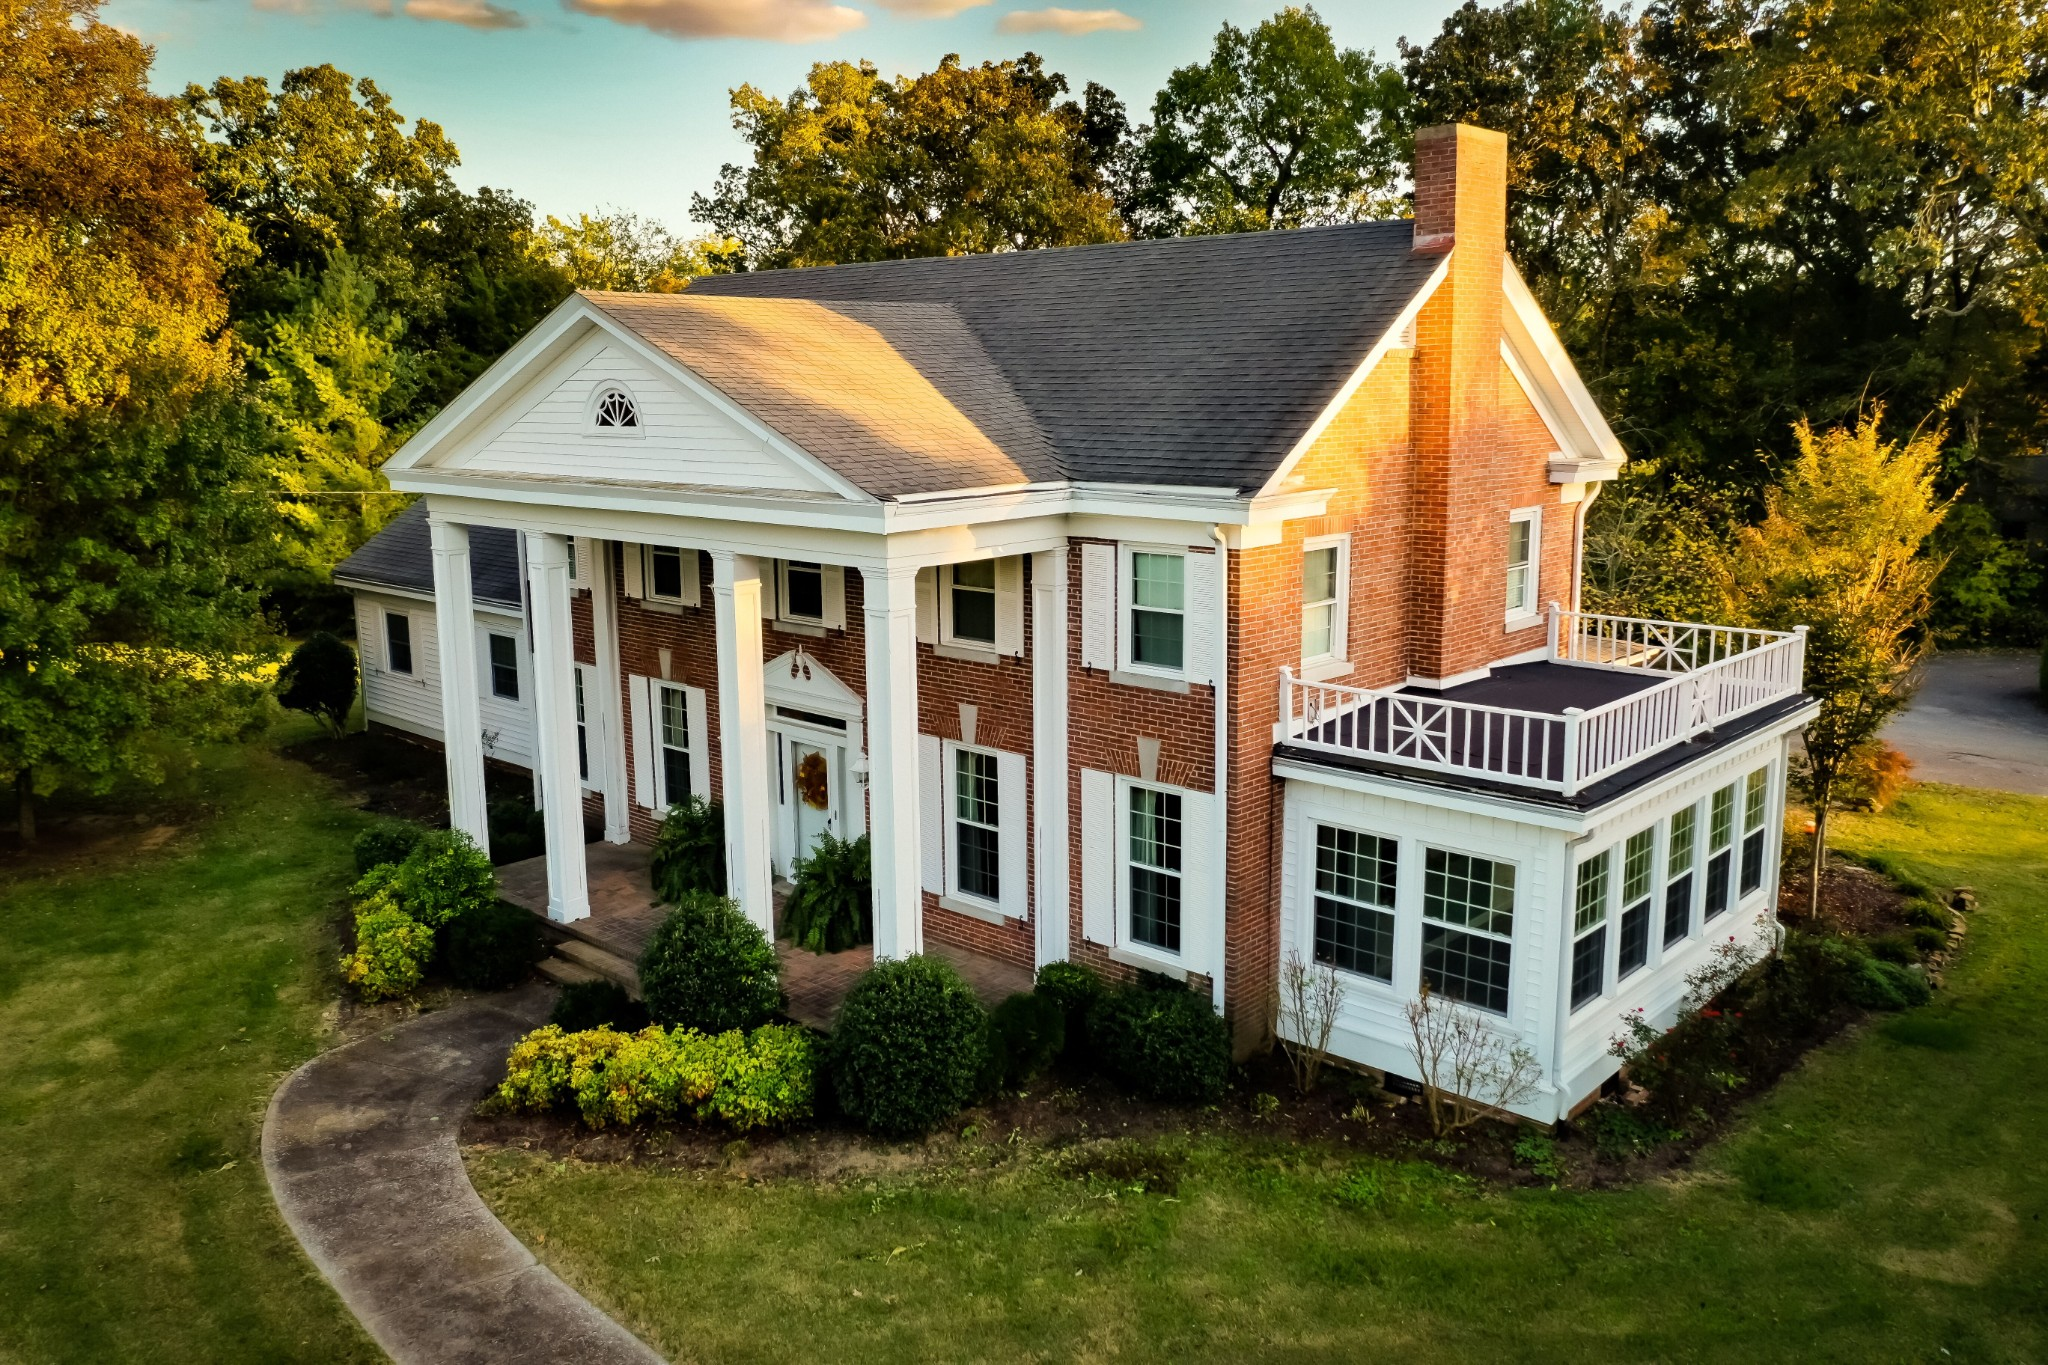 108 Hunting Creek Rd, Hopkinsville, KY 42240 - Hopkinsville, KY real estate listing